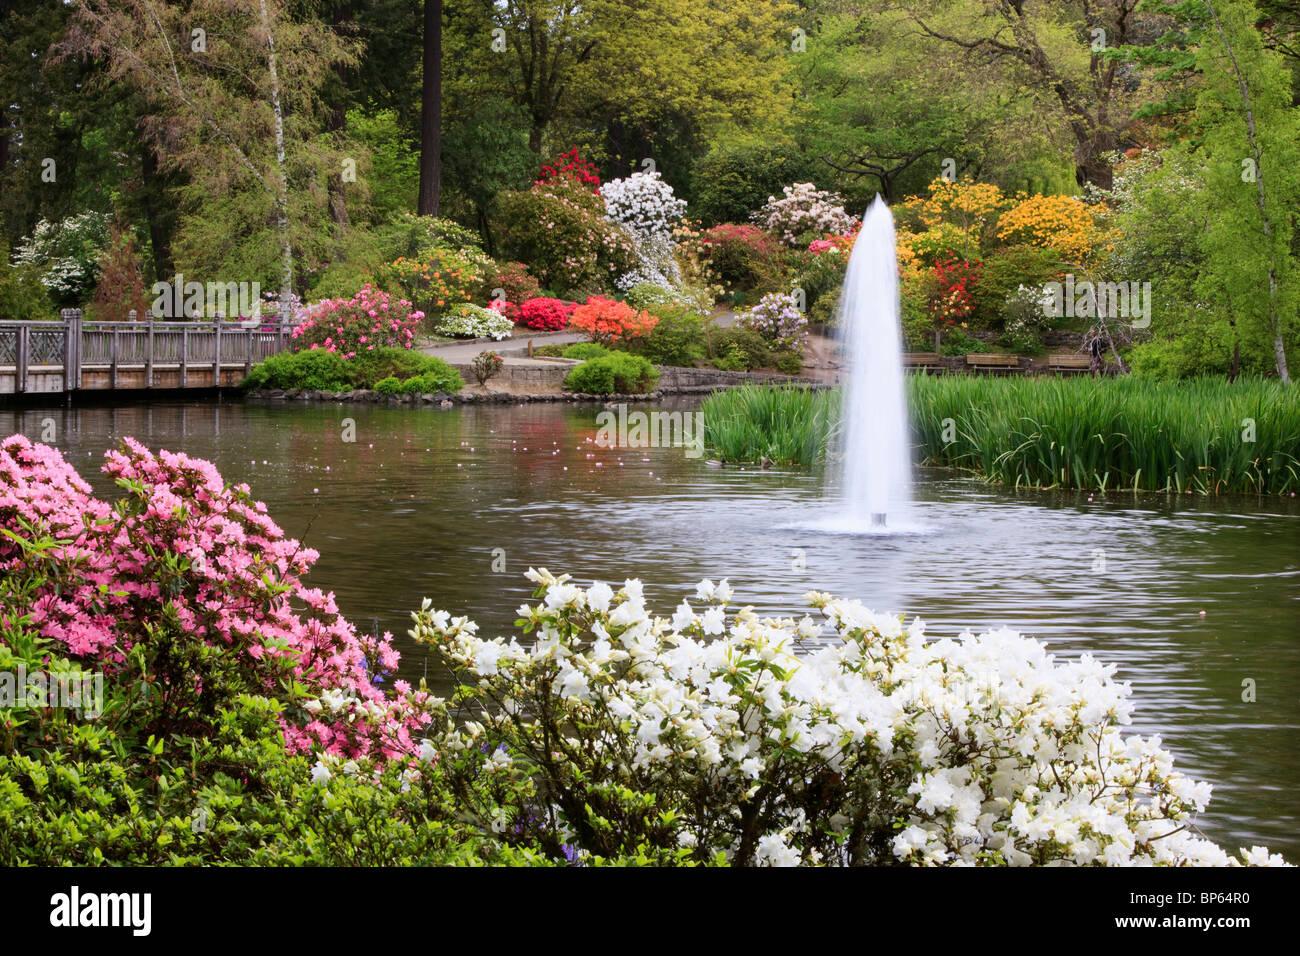 Portland oregon united states of america spring flowers for Garden fountains portland oregon